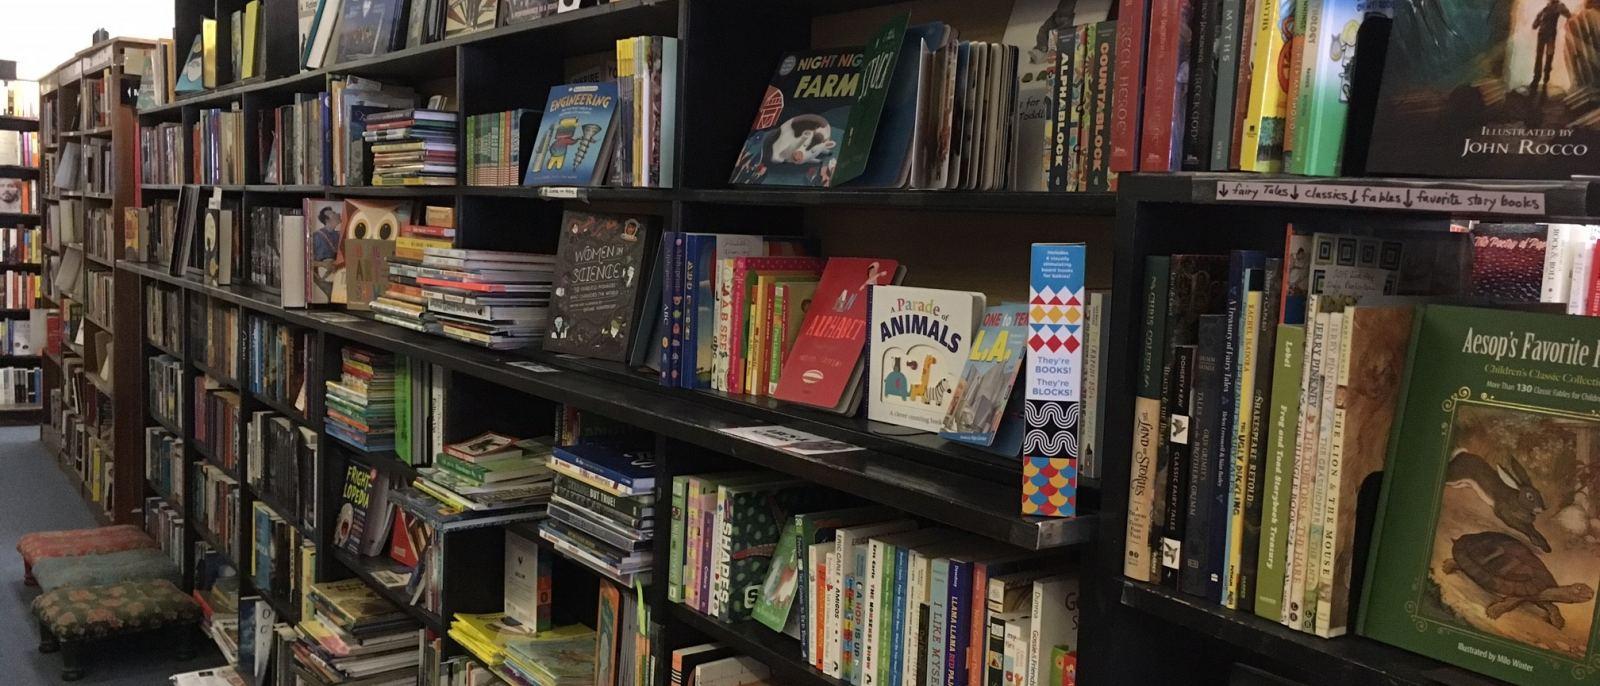 Small World Books children's section